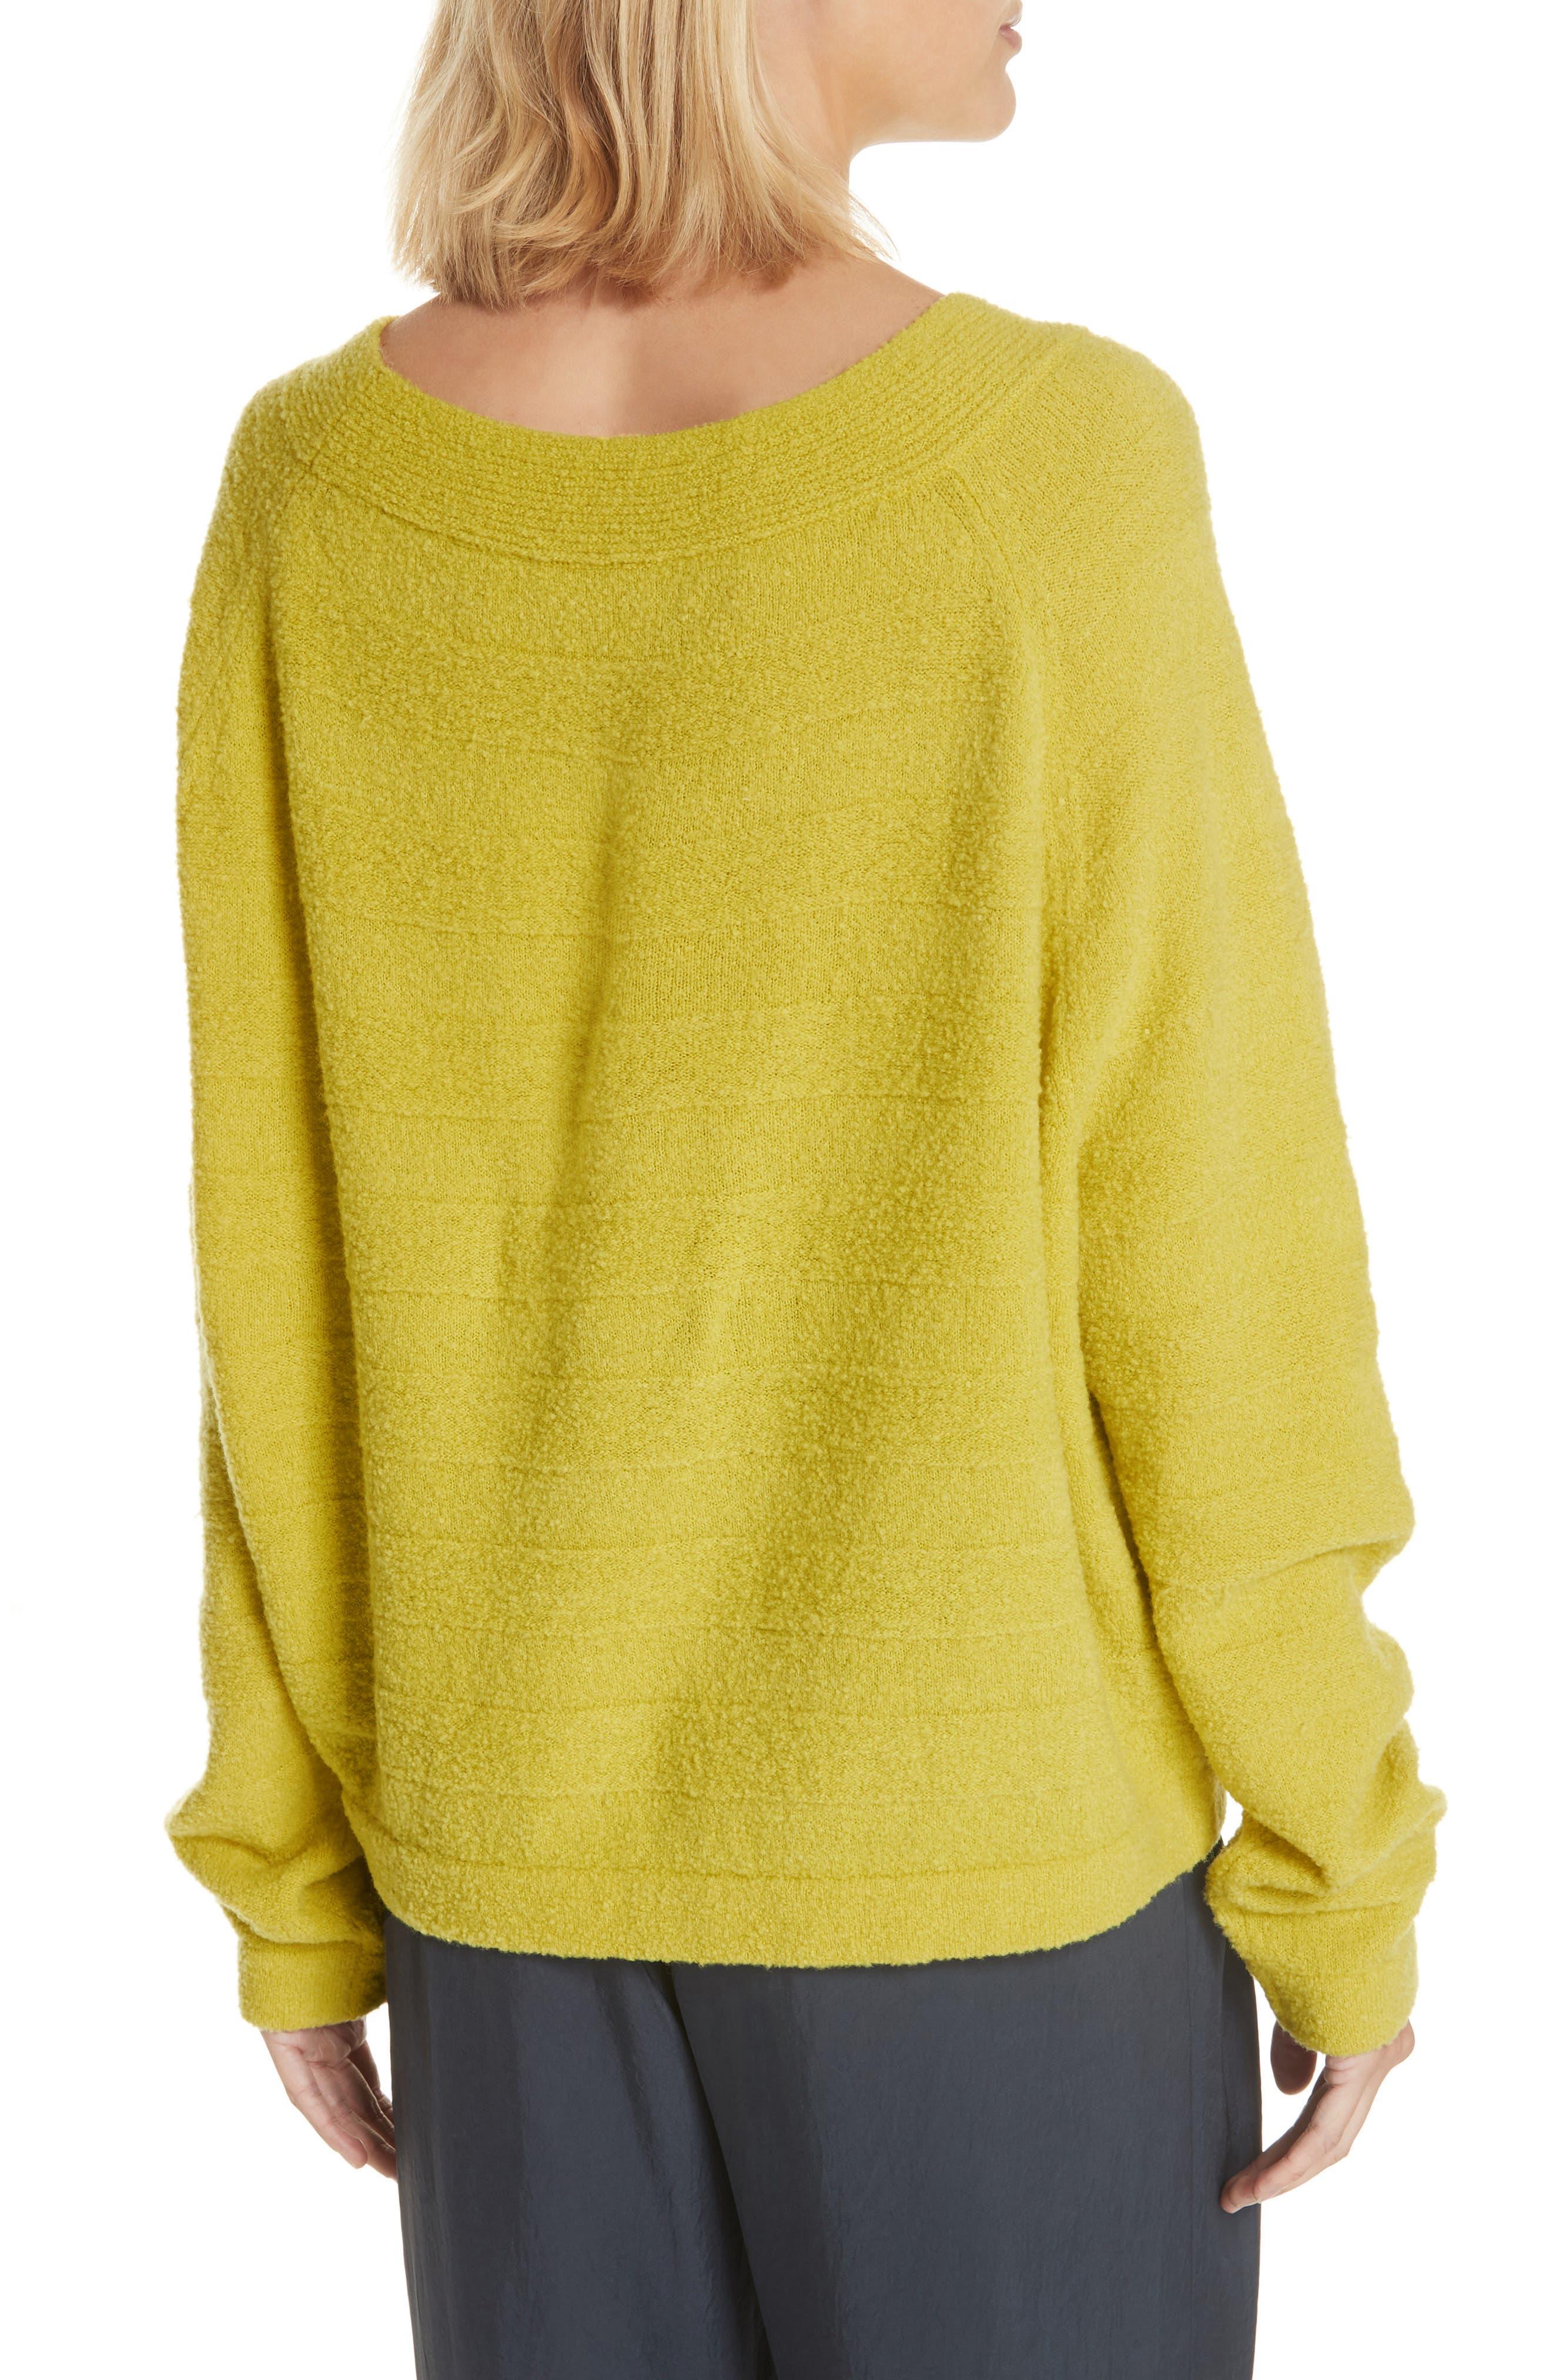 Merino Wool Blend Knit Sweater,                             Alternate thumbnail 2, color,                             Zest